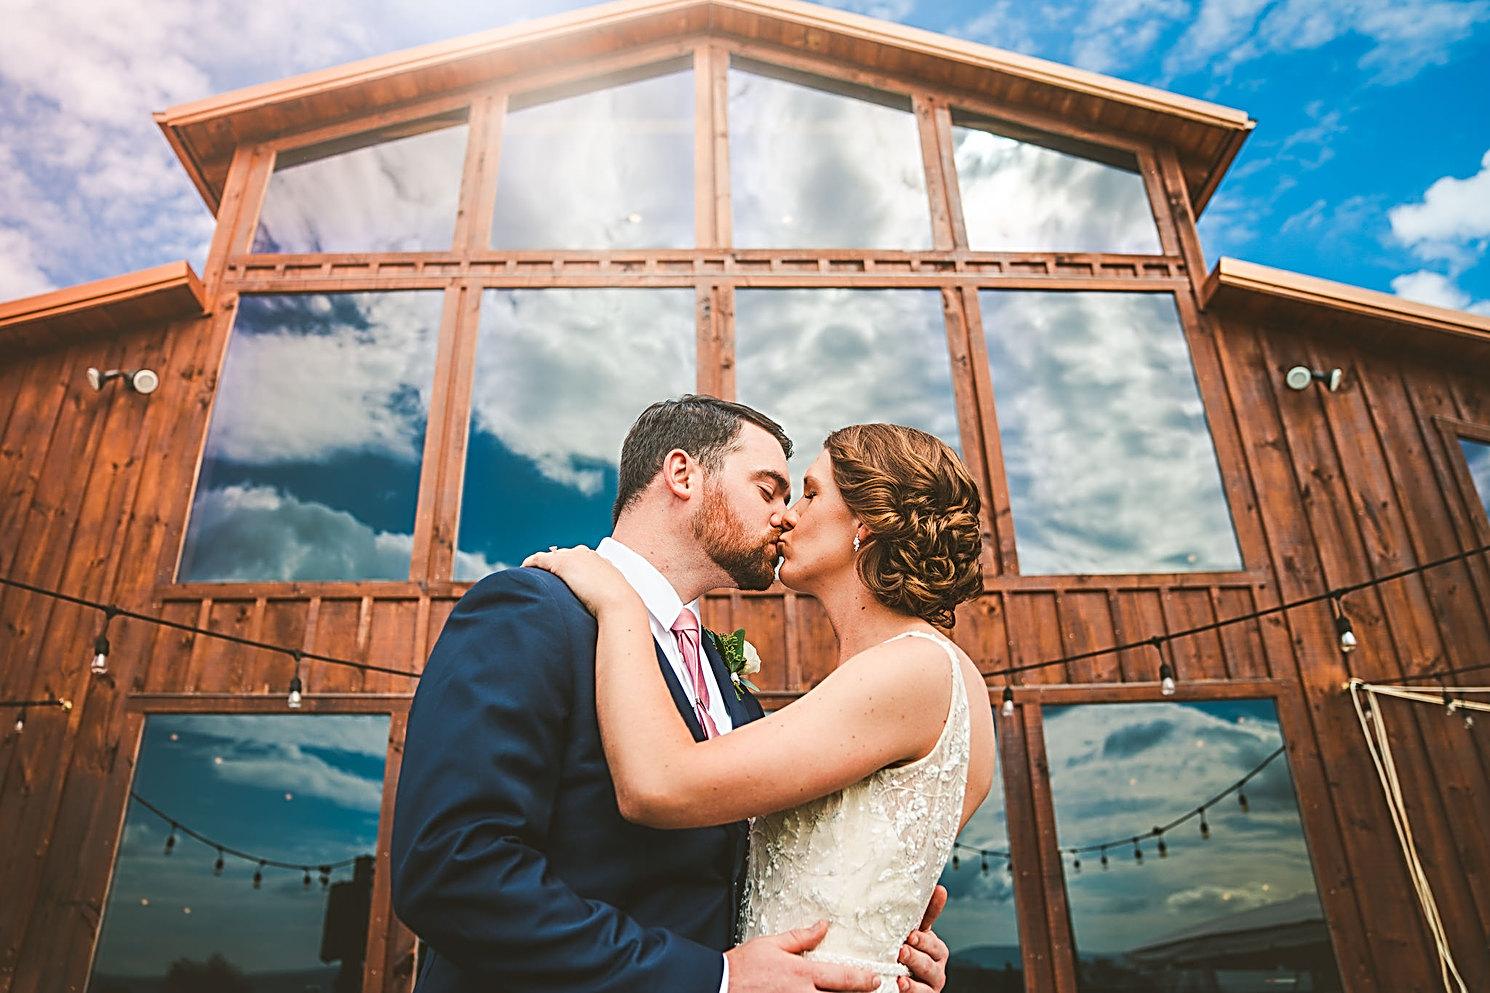 scroller-faithbrooke-vineyard-wedding-ph